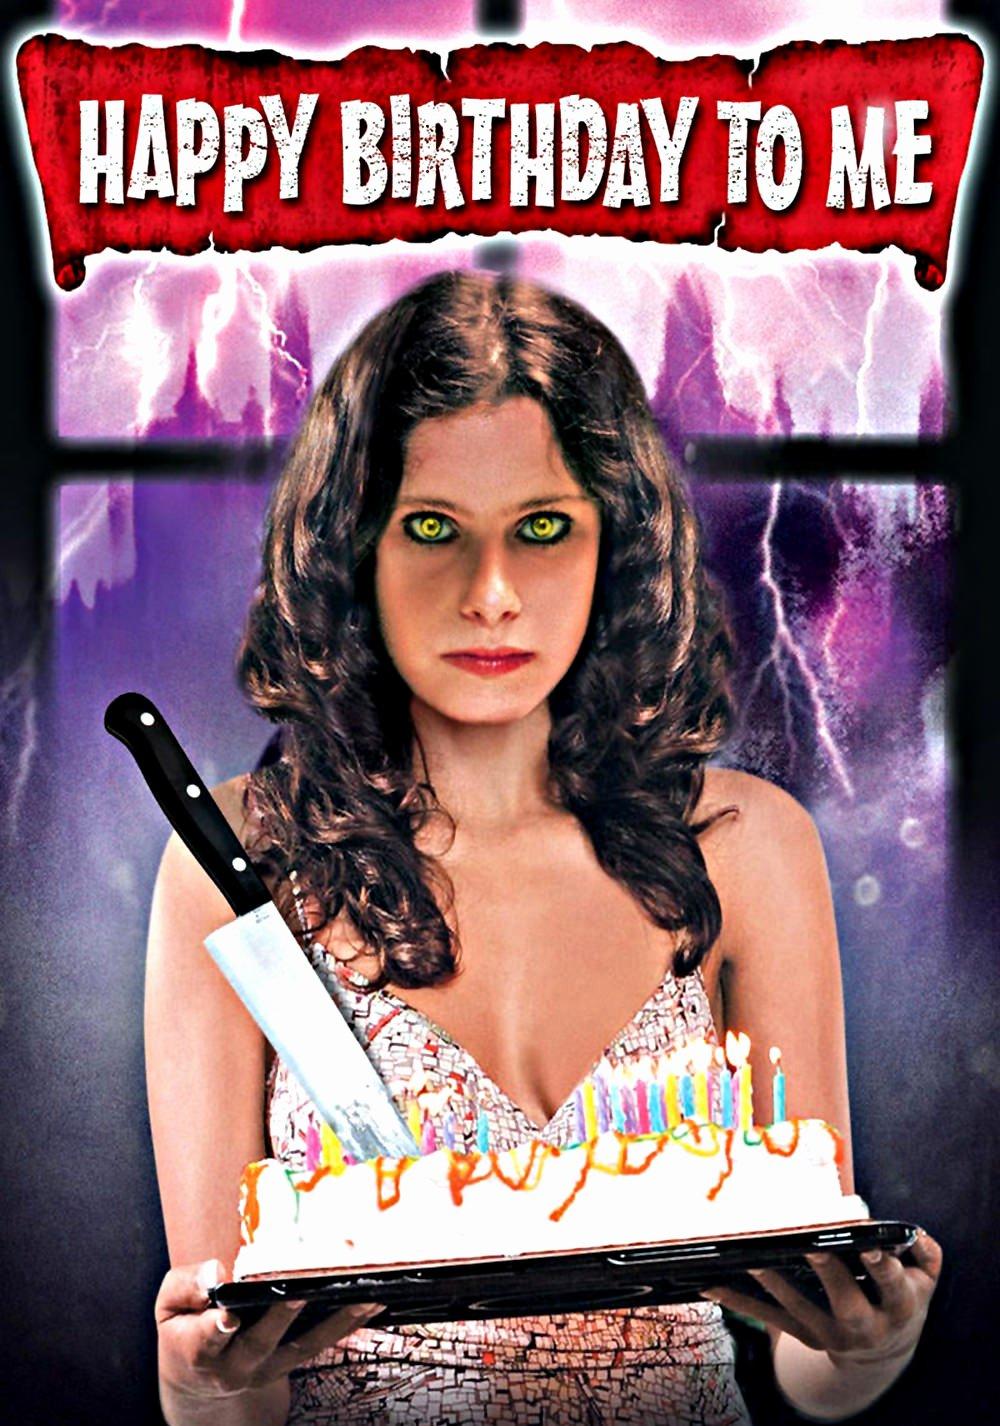 Happy Birthday to Me Poster Lovely Happy Birthday to Me Movie Fanart